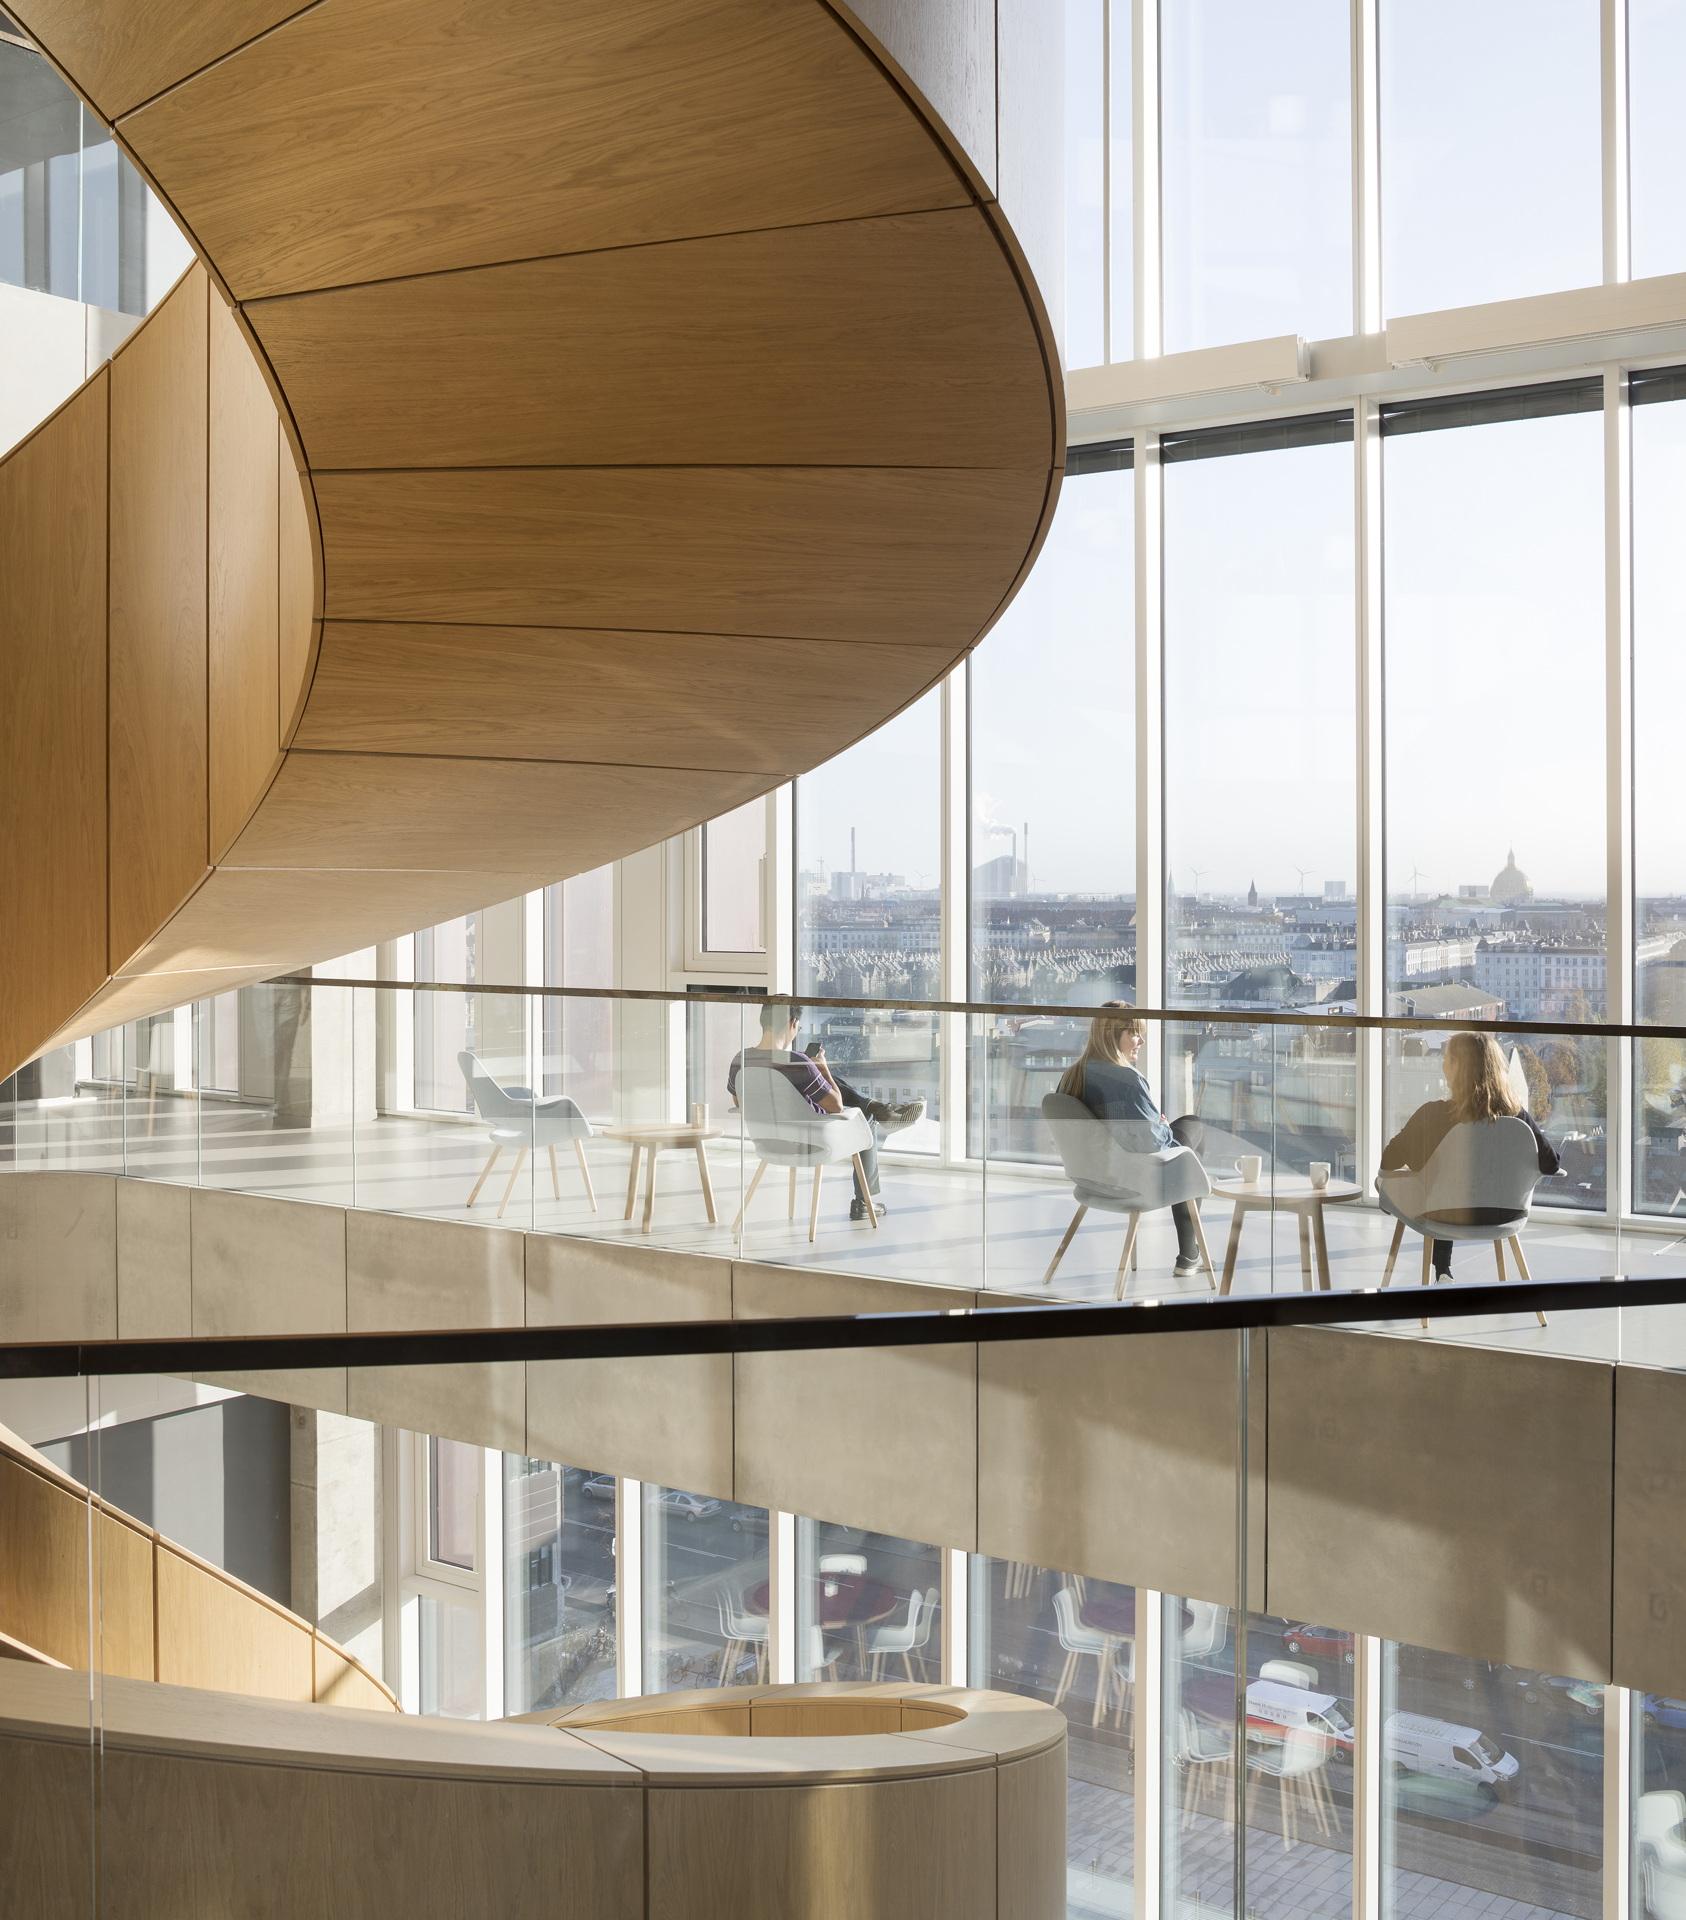 C.F. Møller: Maersk Tower, Panum Building in Kopenhagen